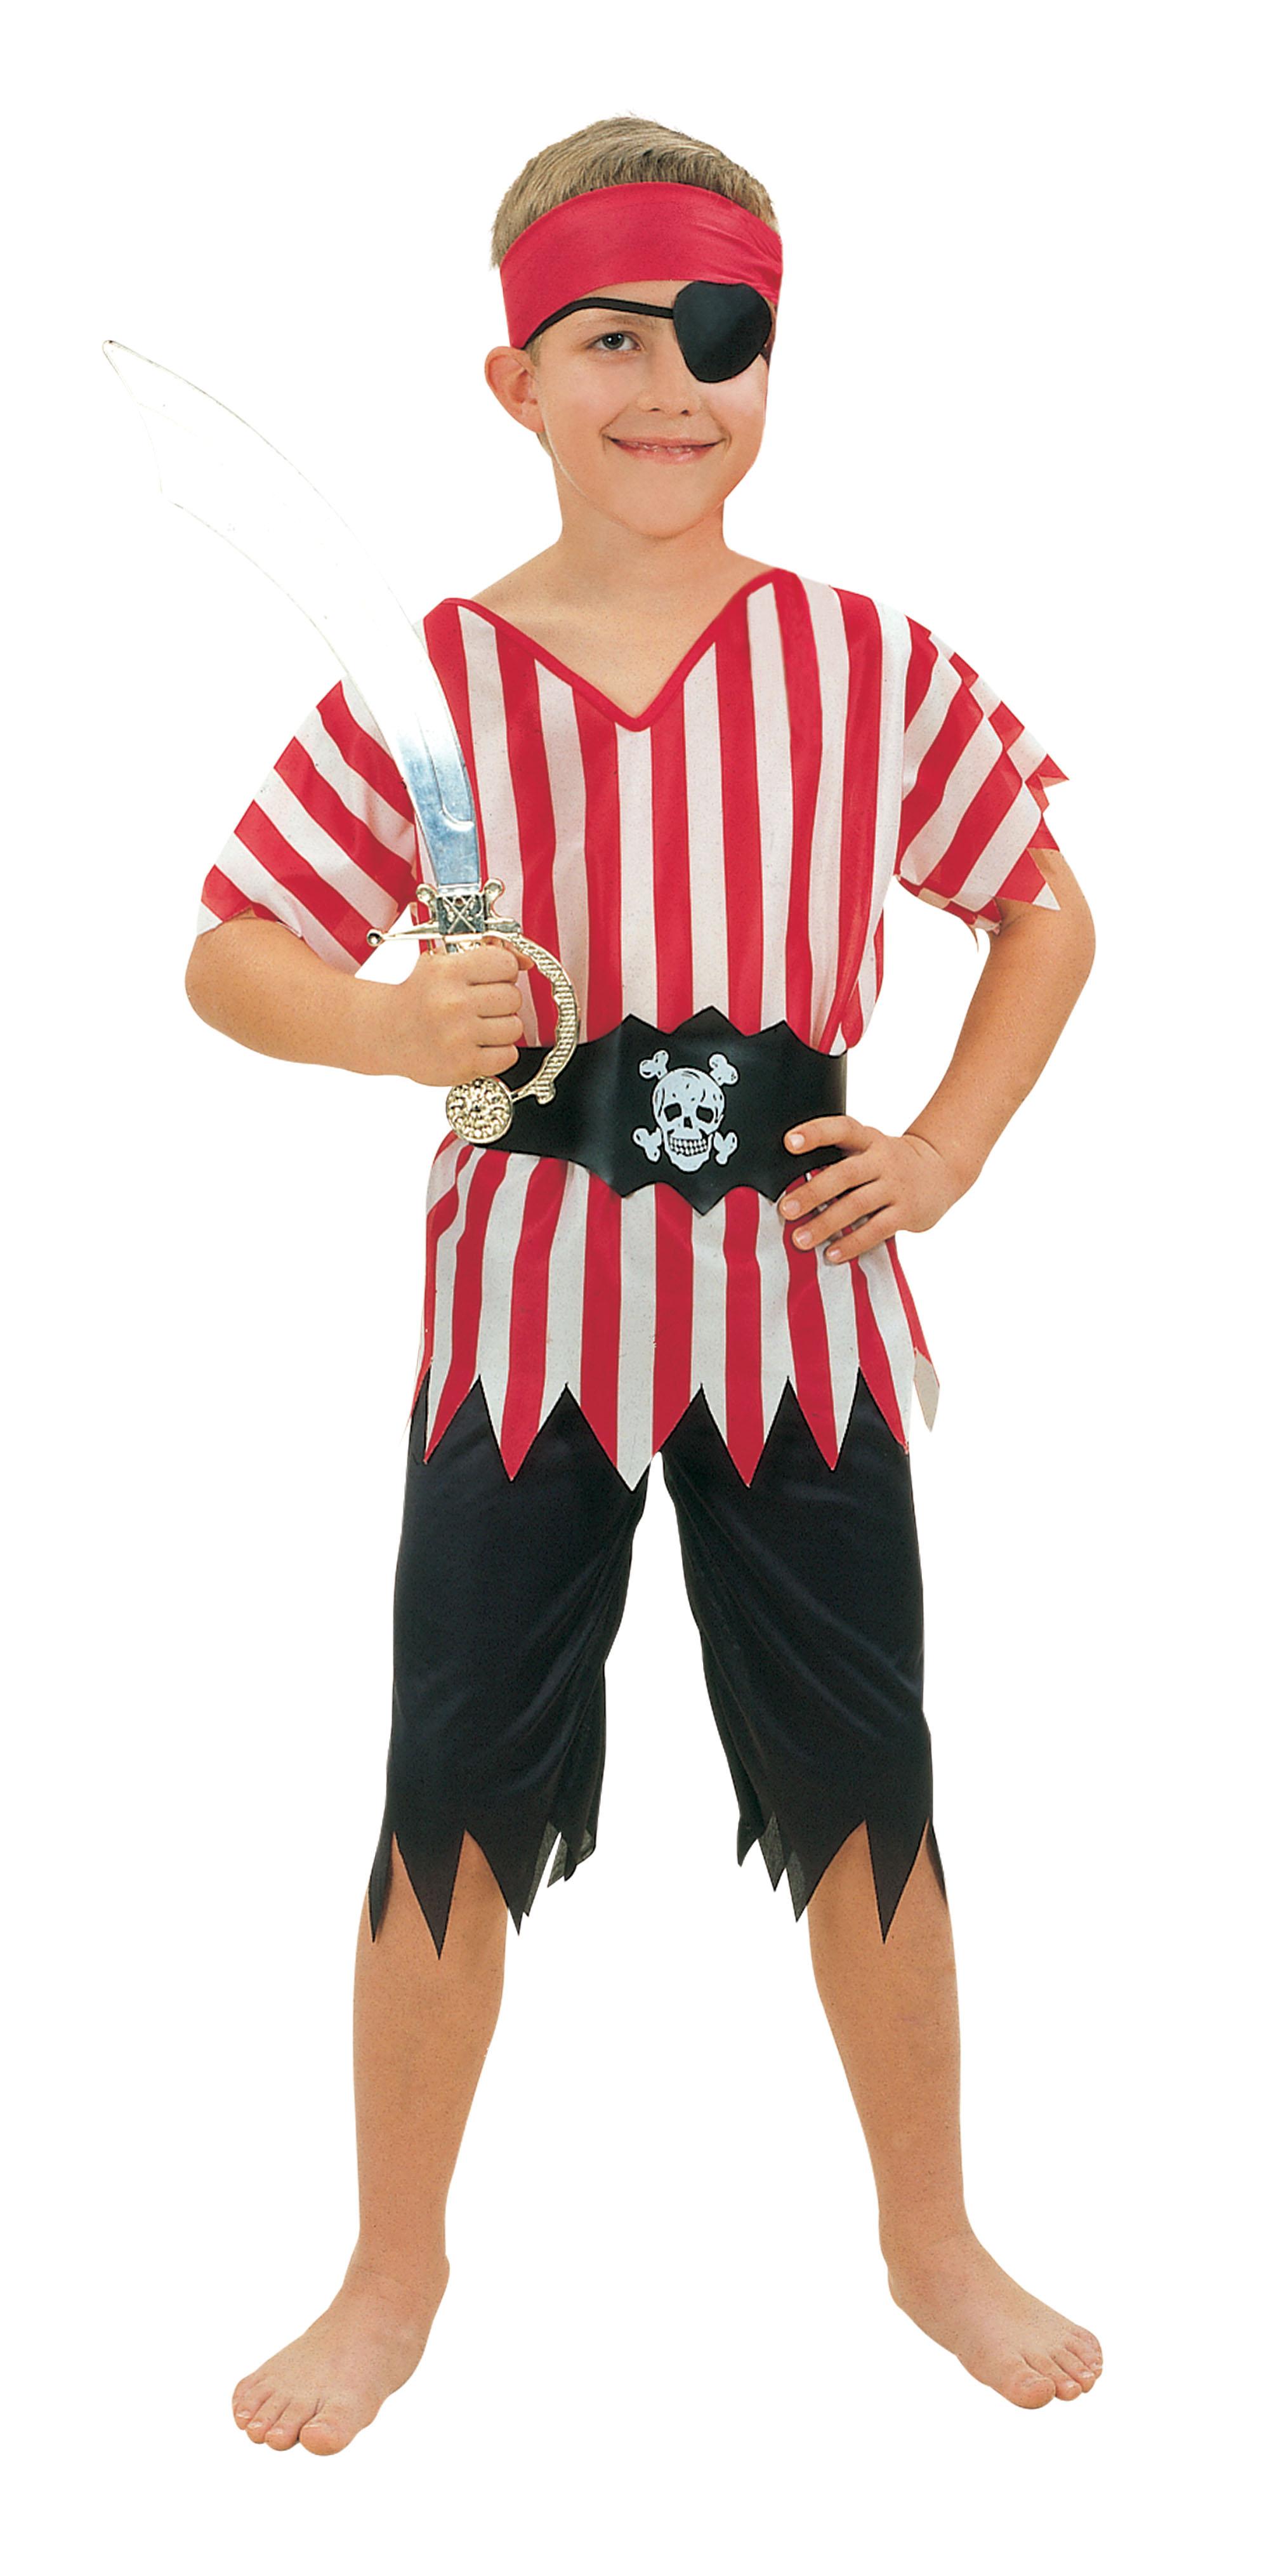 Childs Pirate Boy Costume